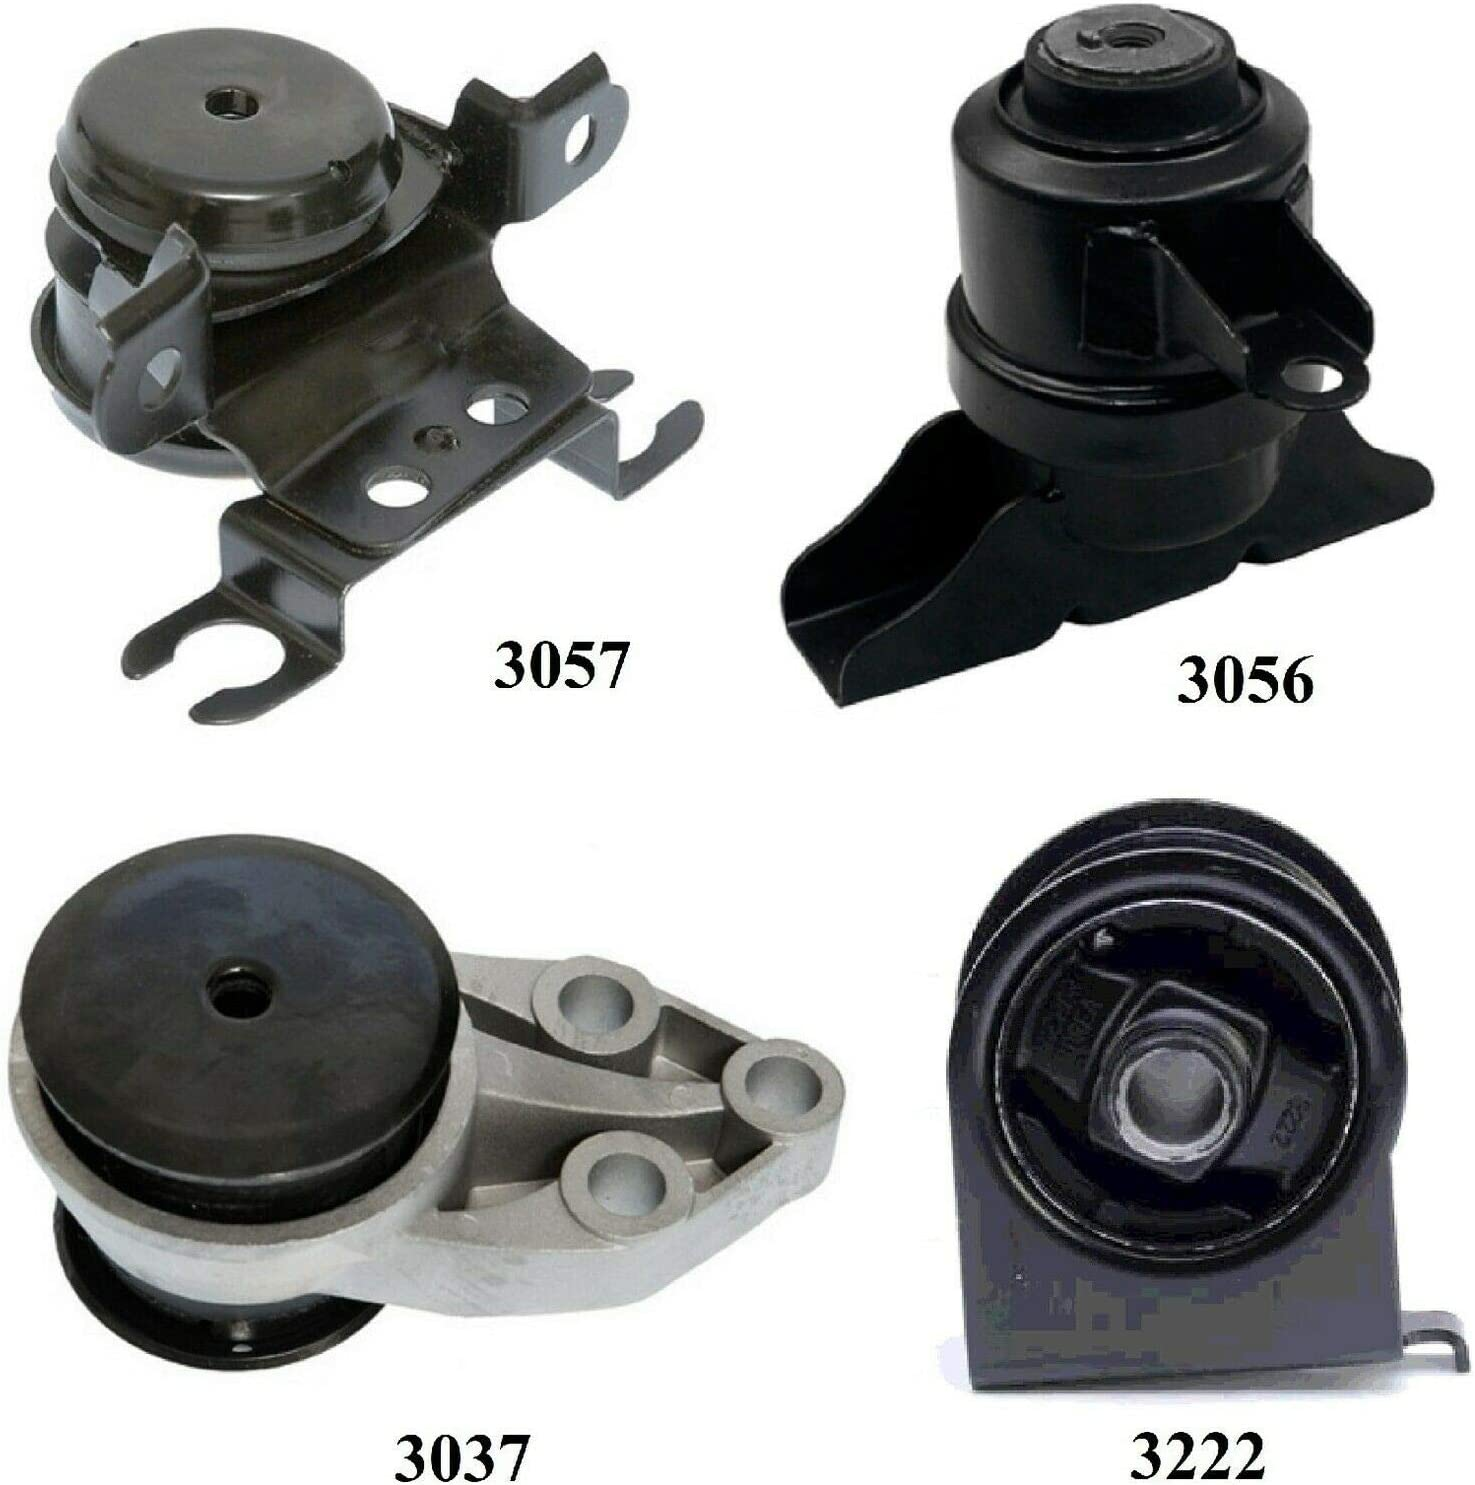 8USAUTO 4 PCS Motor /& Trans Mount FIT 2001-2004 Ford Escape 2.0L /& 3.0L